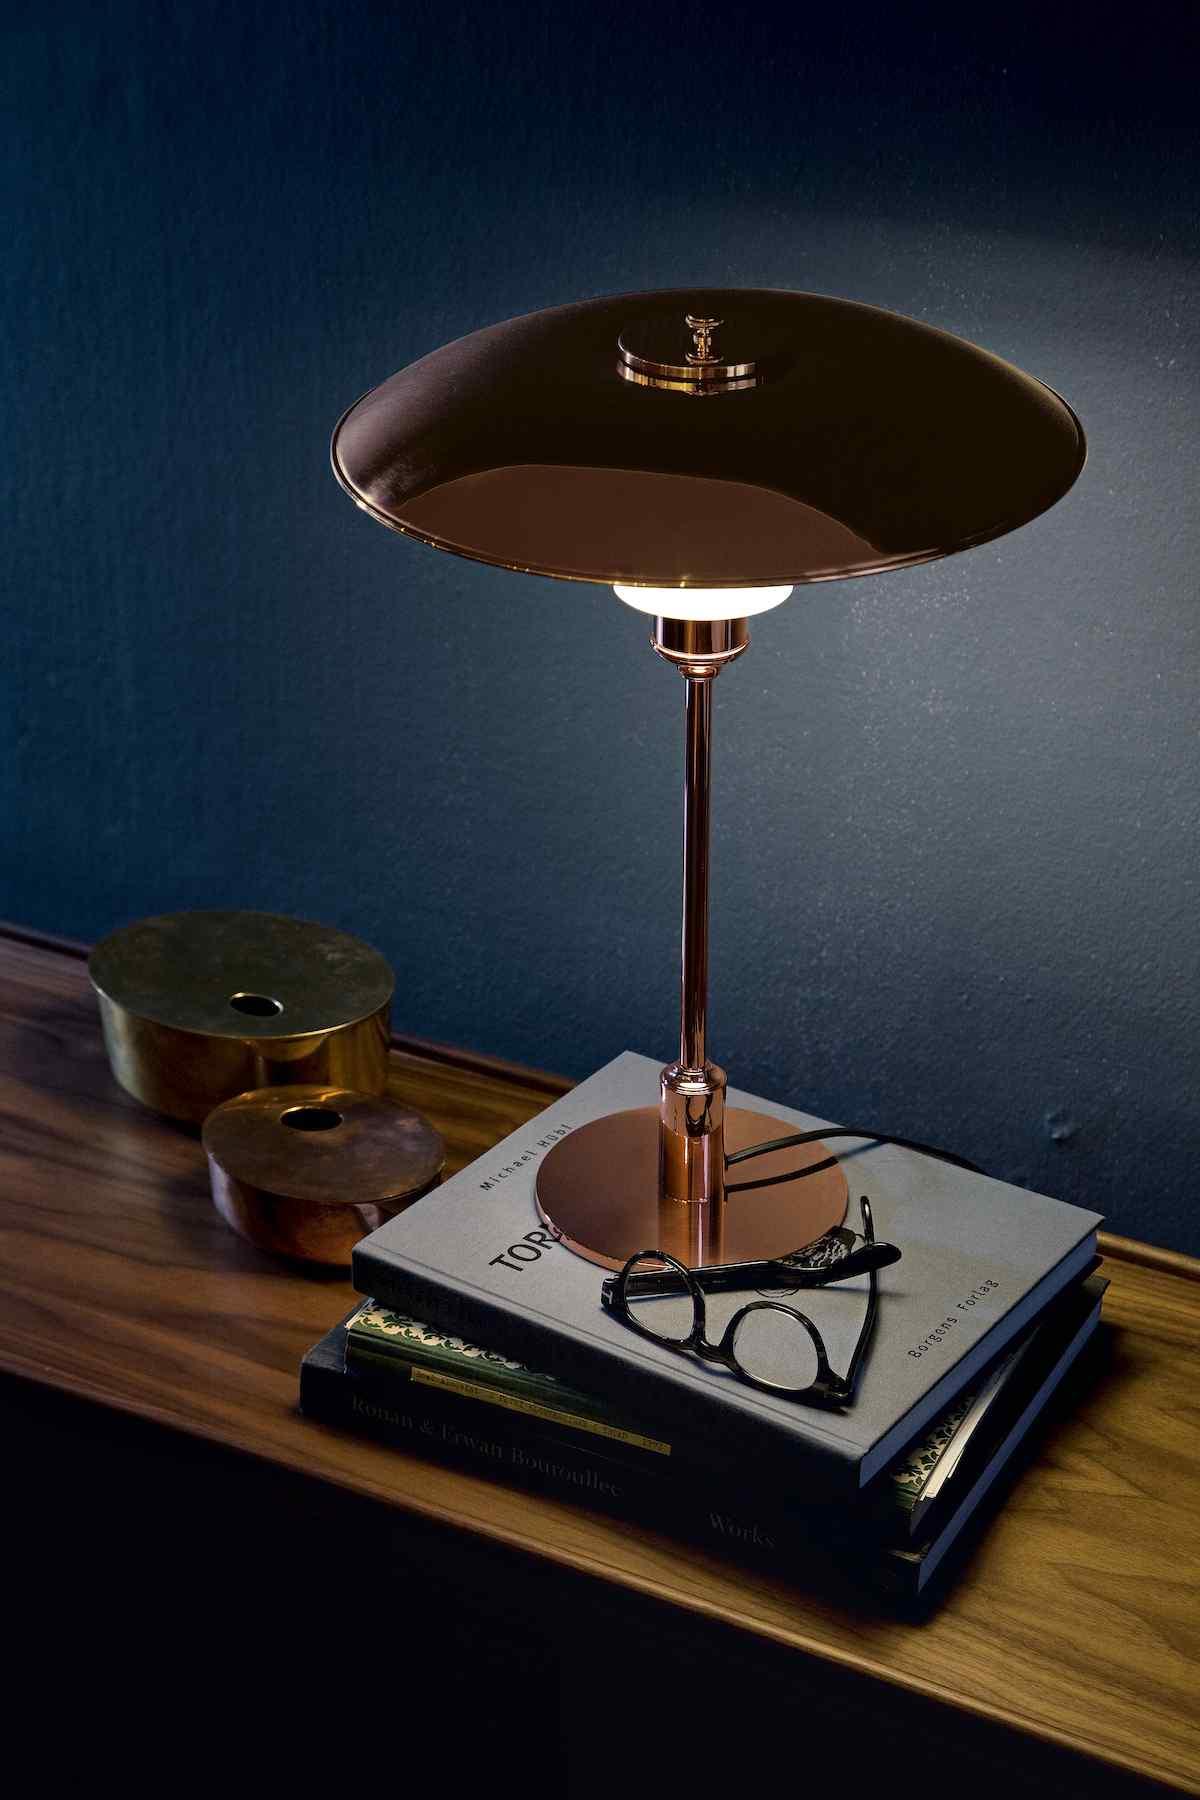 louis poulsen ph 3 2 kupfer tischleuchte limitedt. Black Bedroom Furniture Sets. Home Design Ideas